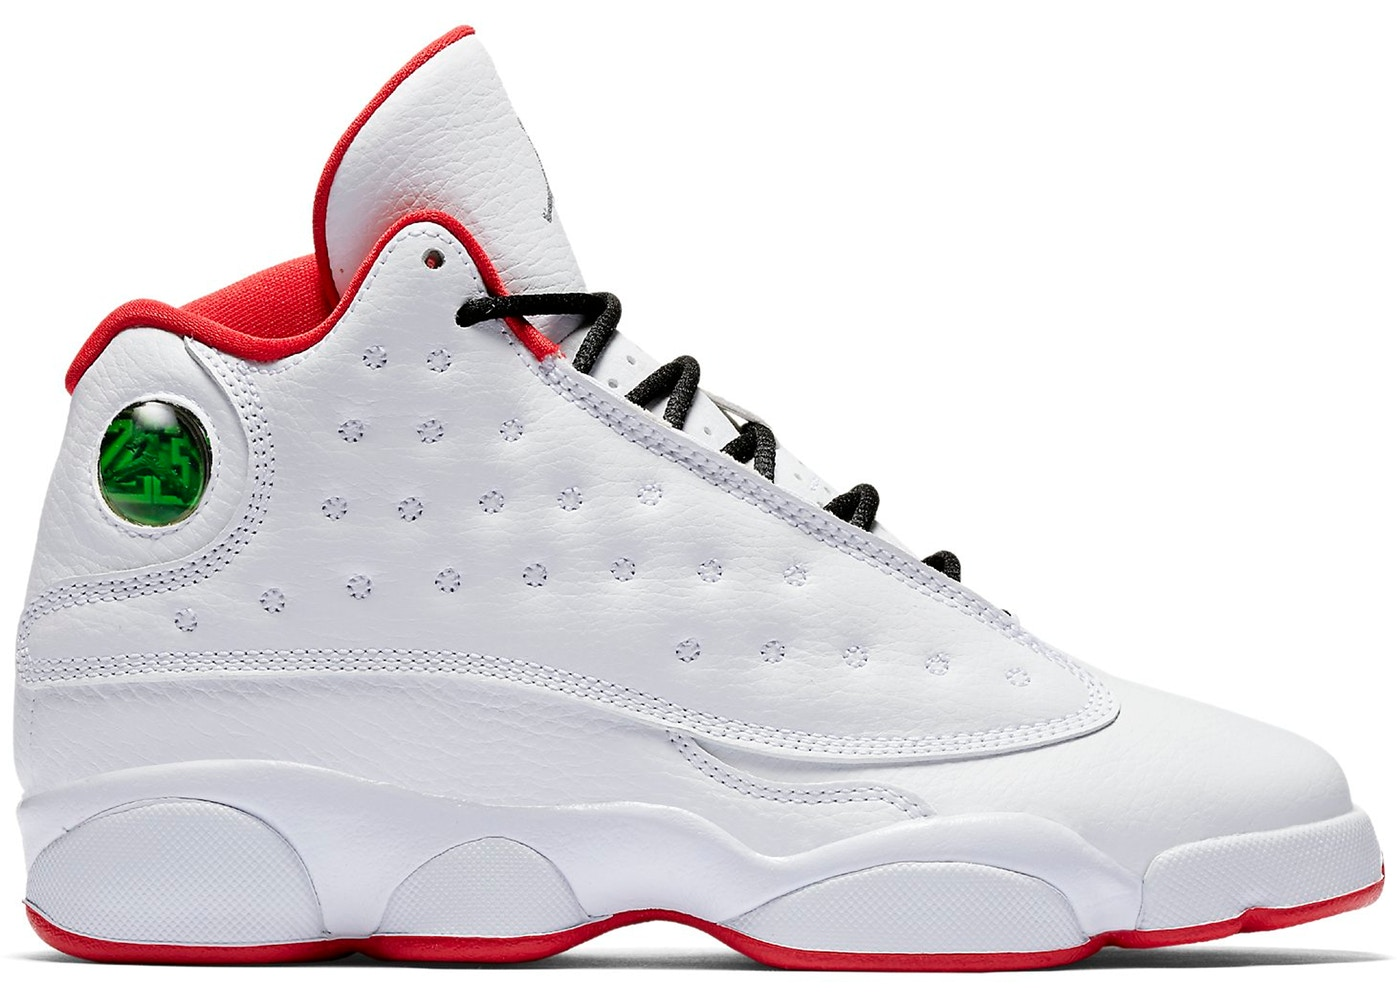 lowest price cdb89 2e80e Buy Air Jordan 13 Shoes   Deadstock Sneakers